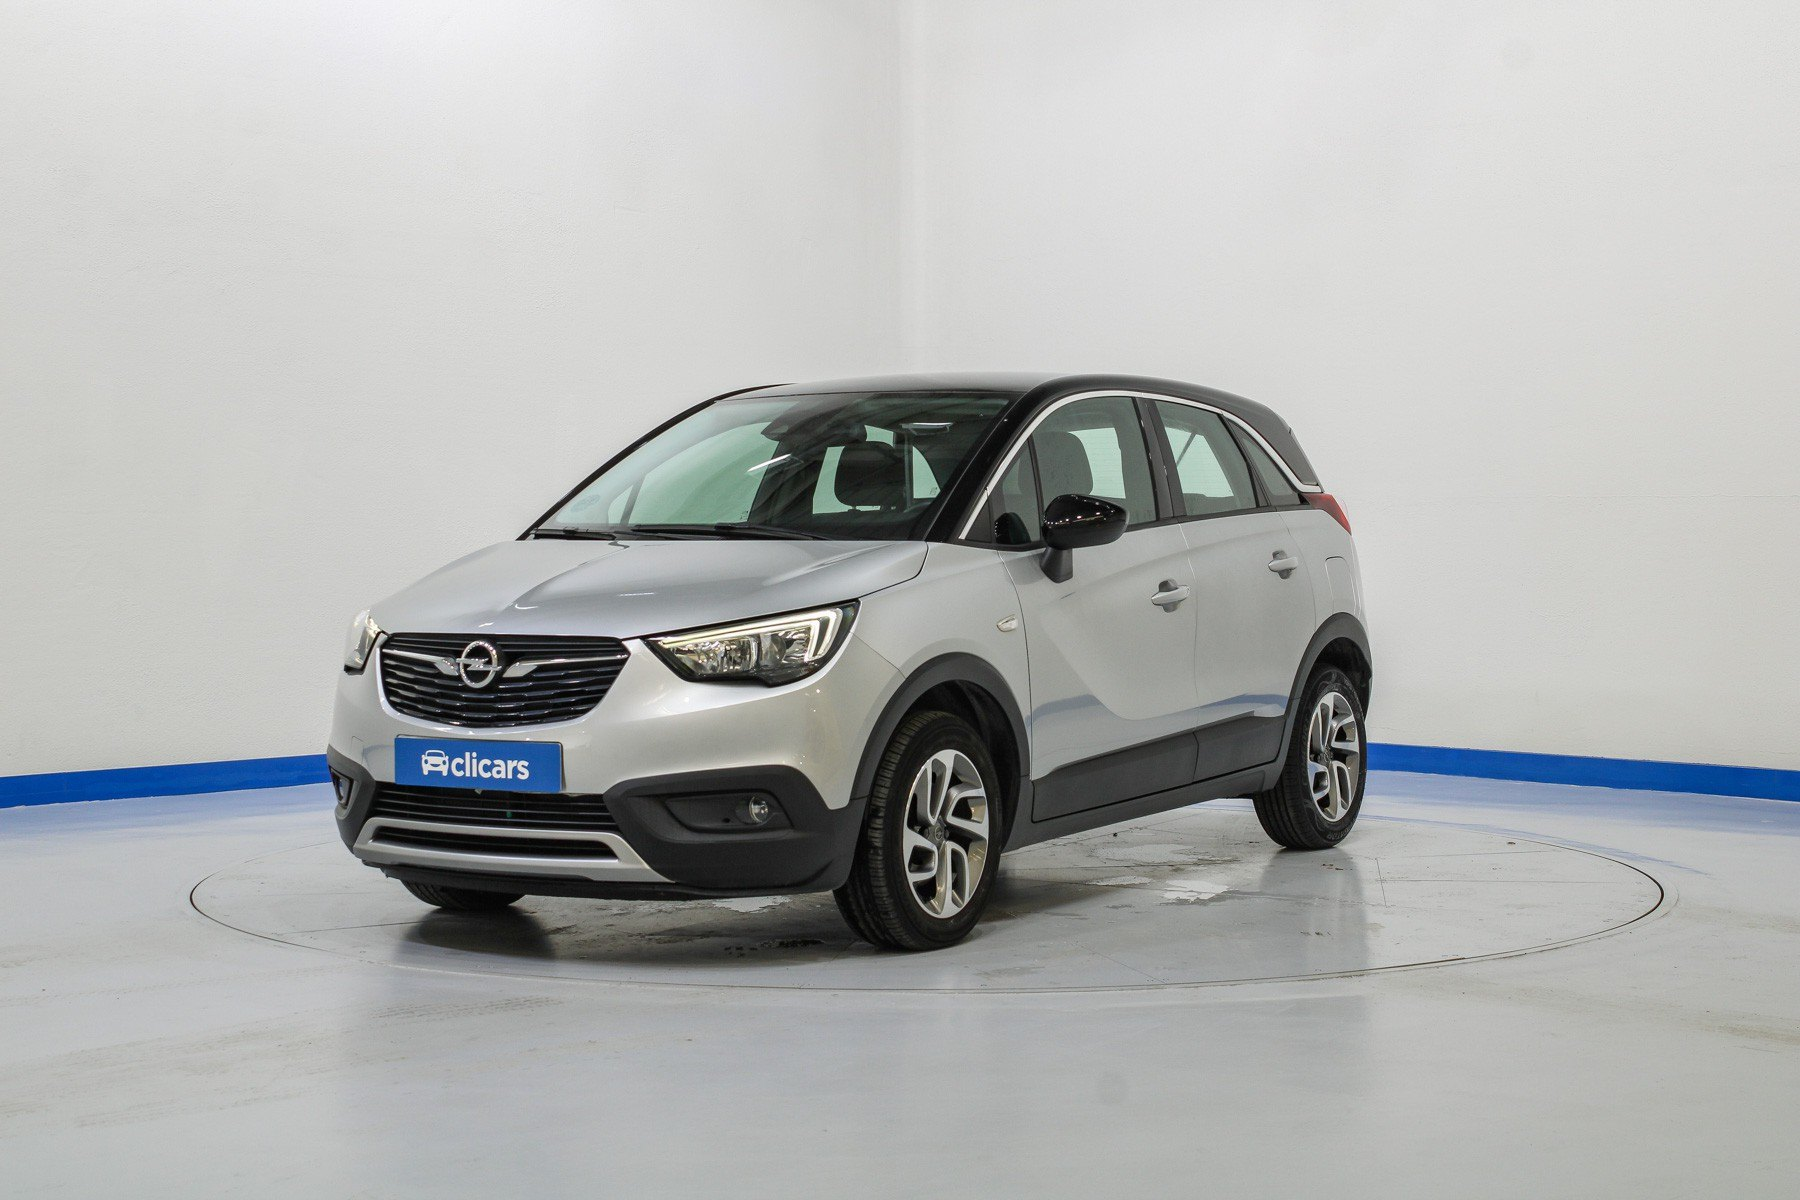 Opel Crossland X Gasolina 1.2 81kW Design Line 120 Aniversario S/S 1